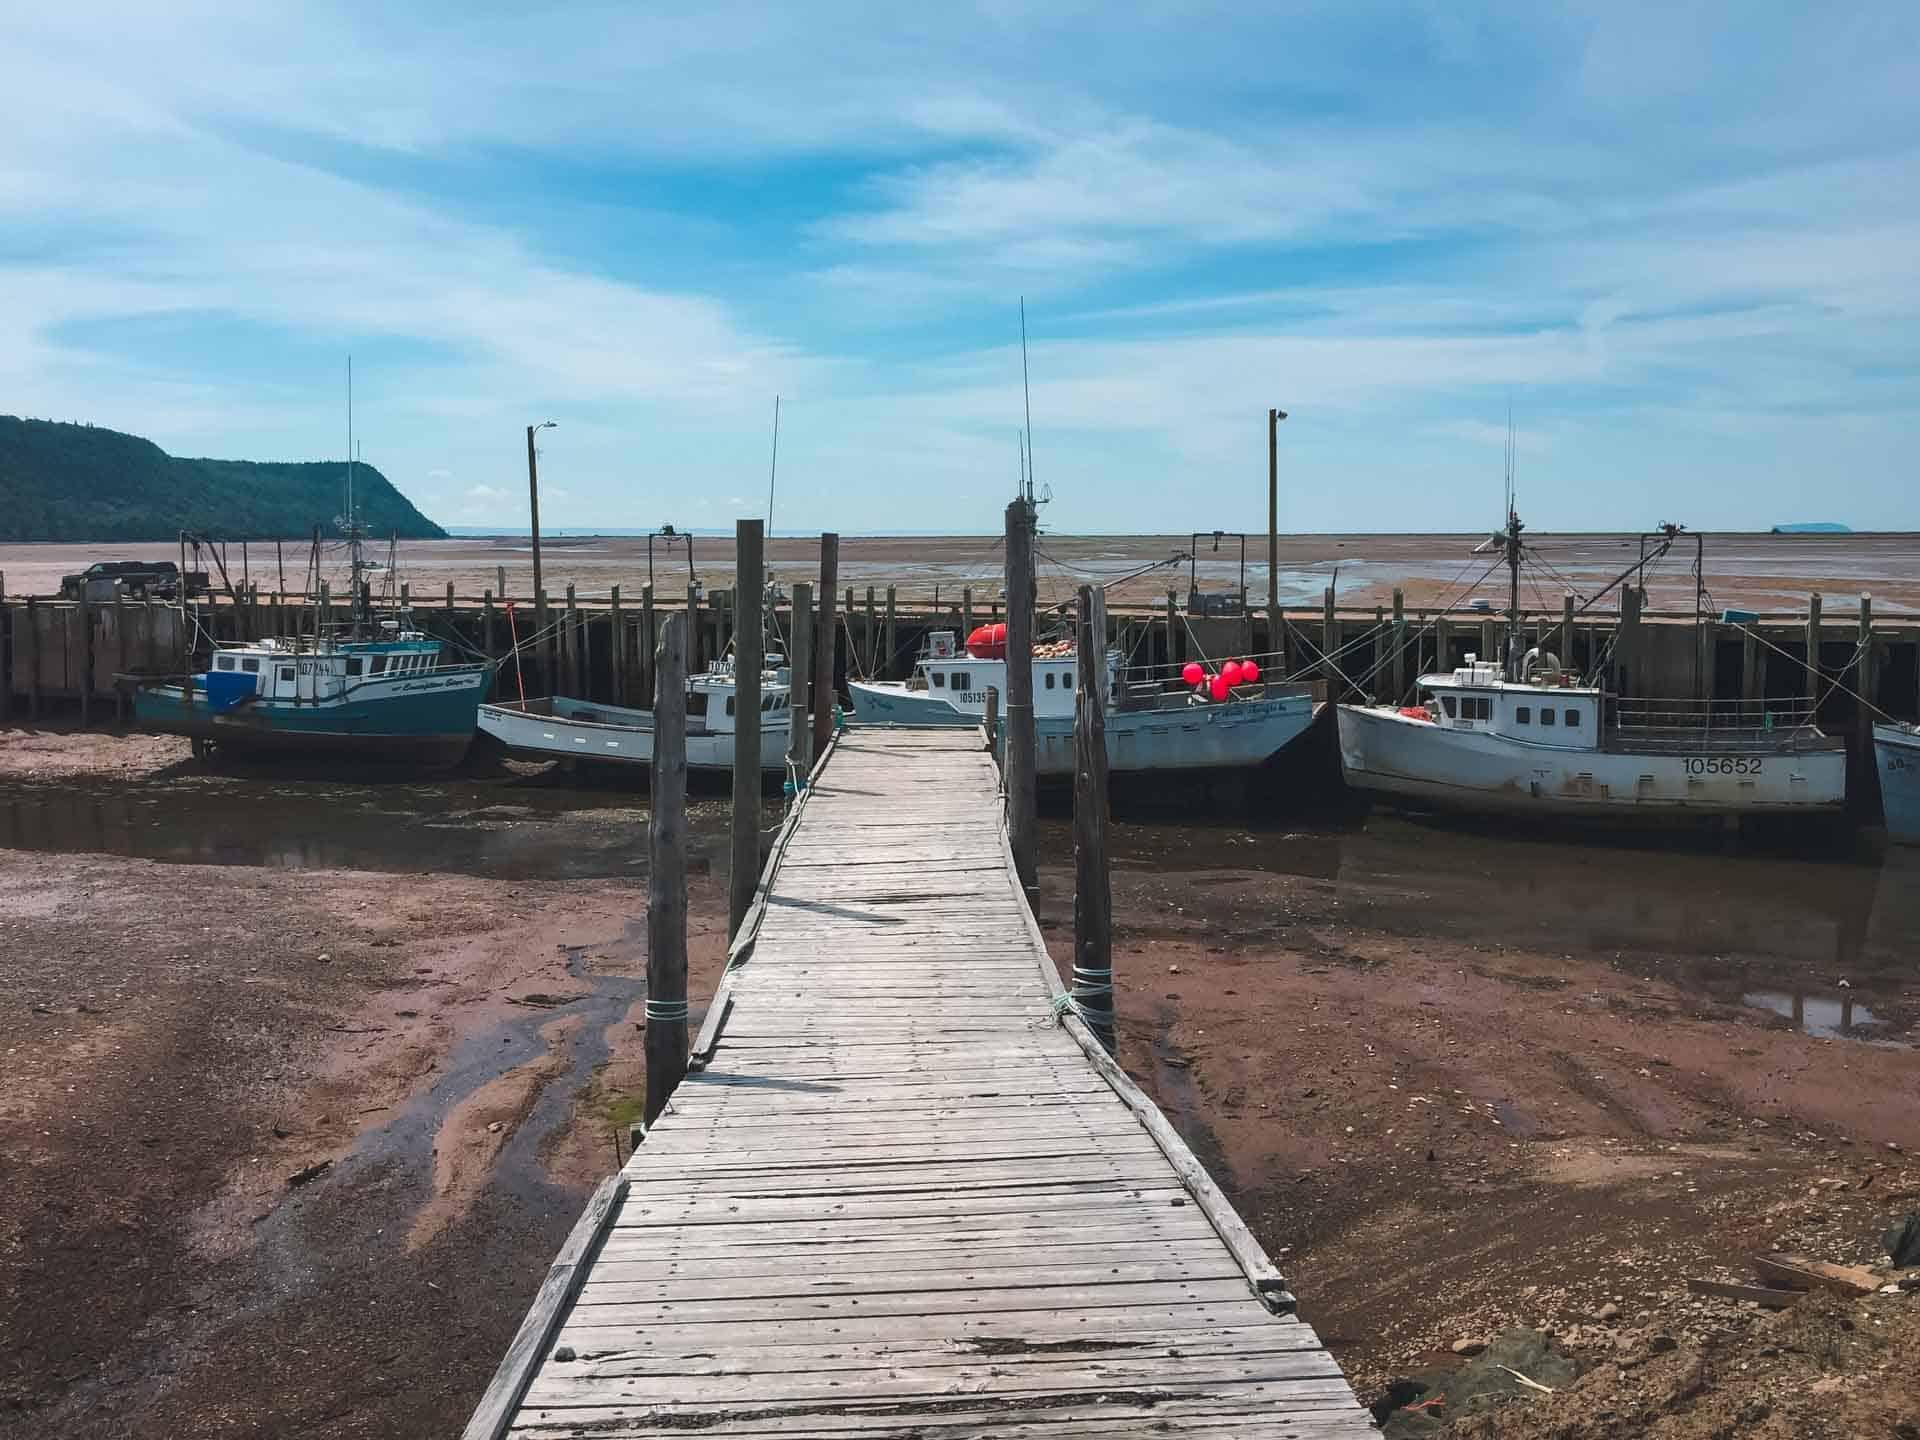 Hall's Harbour in Nova Scotia